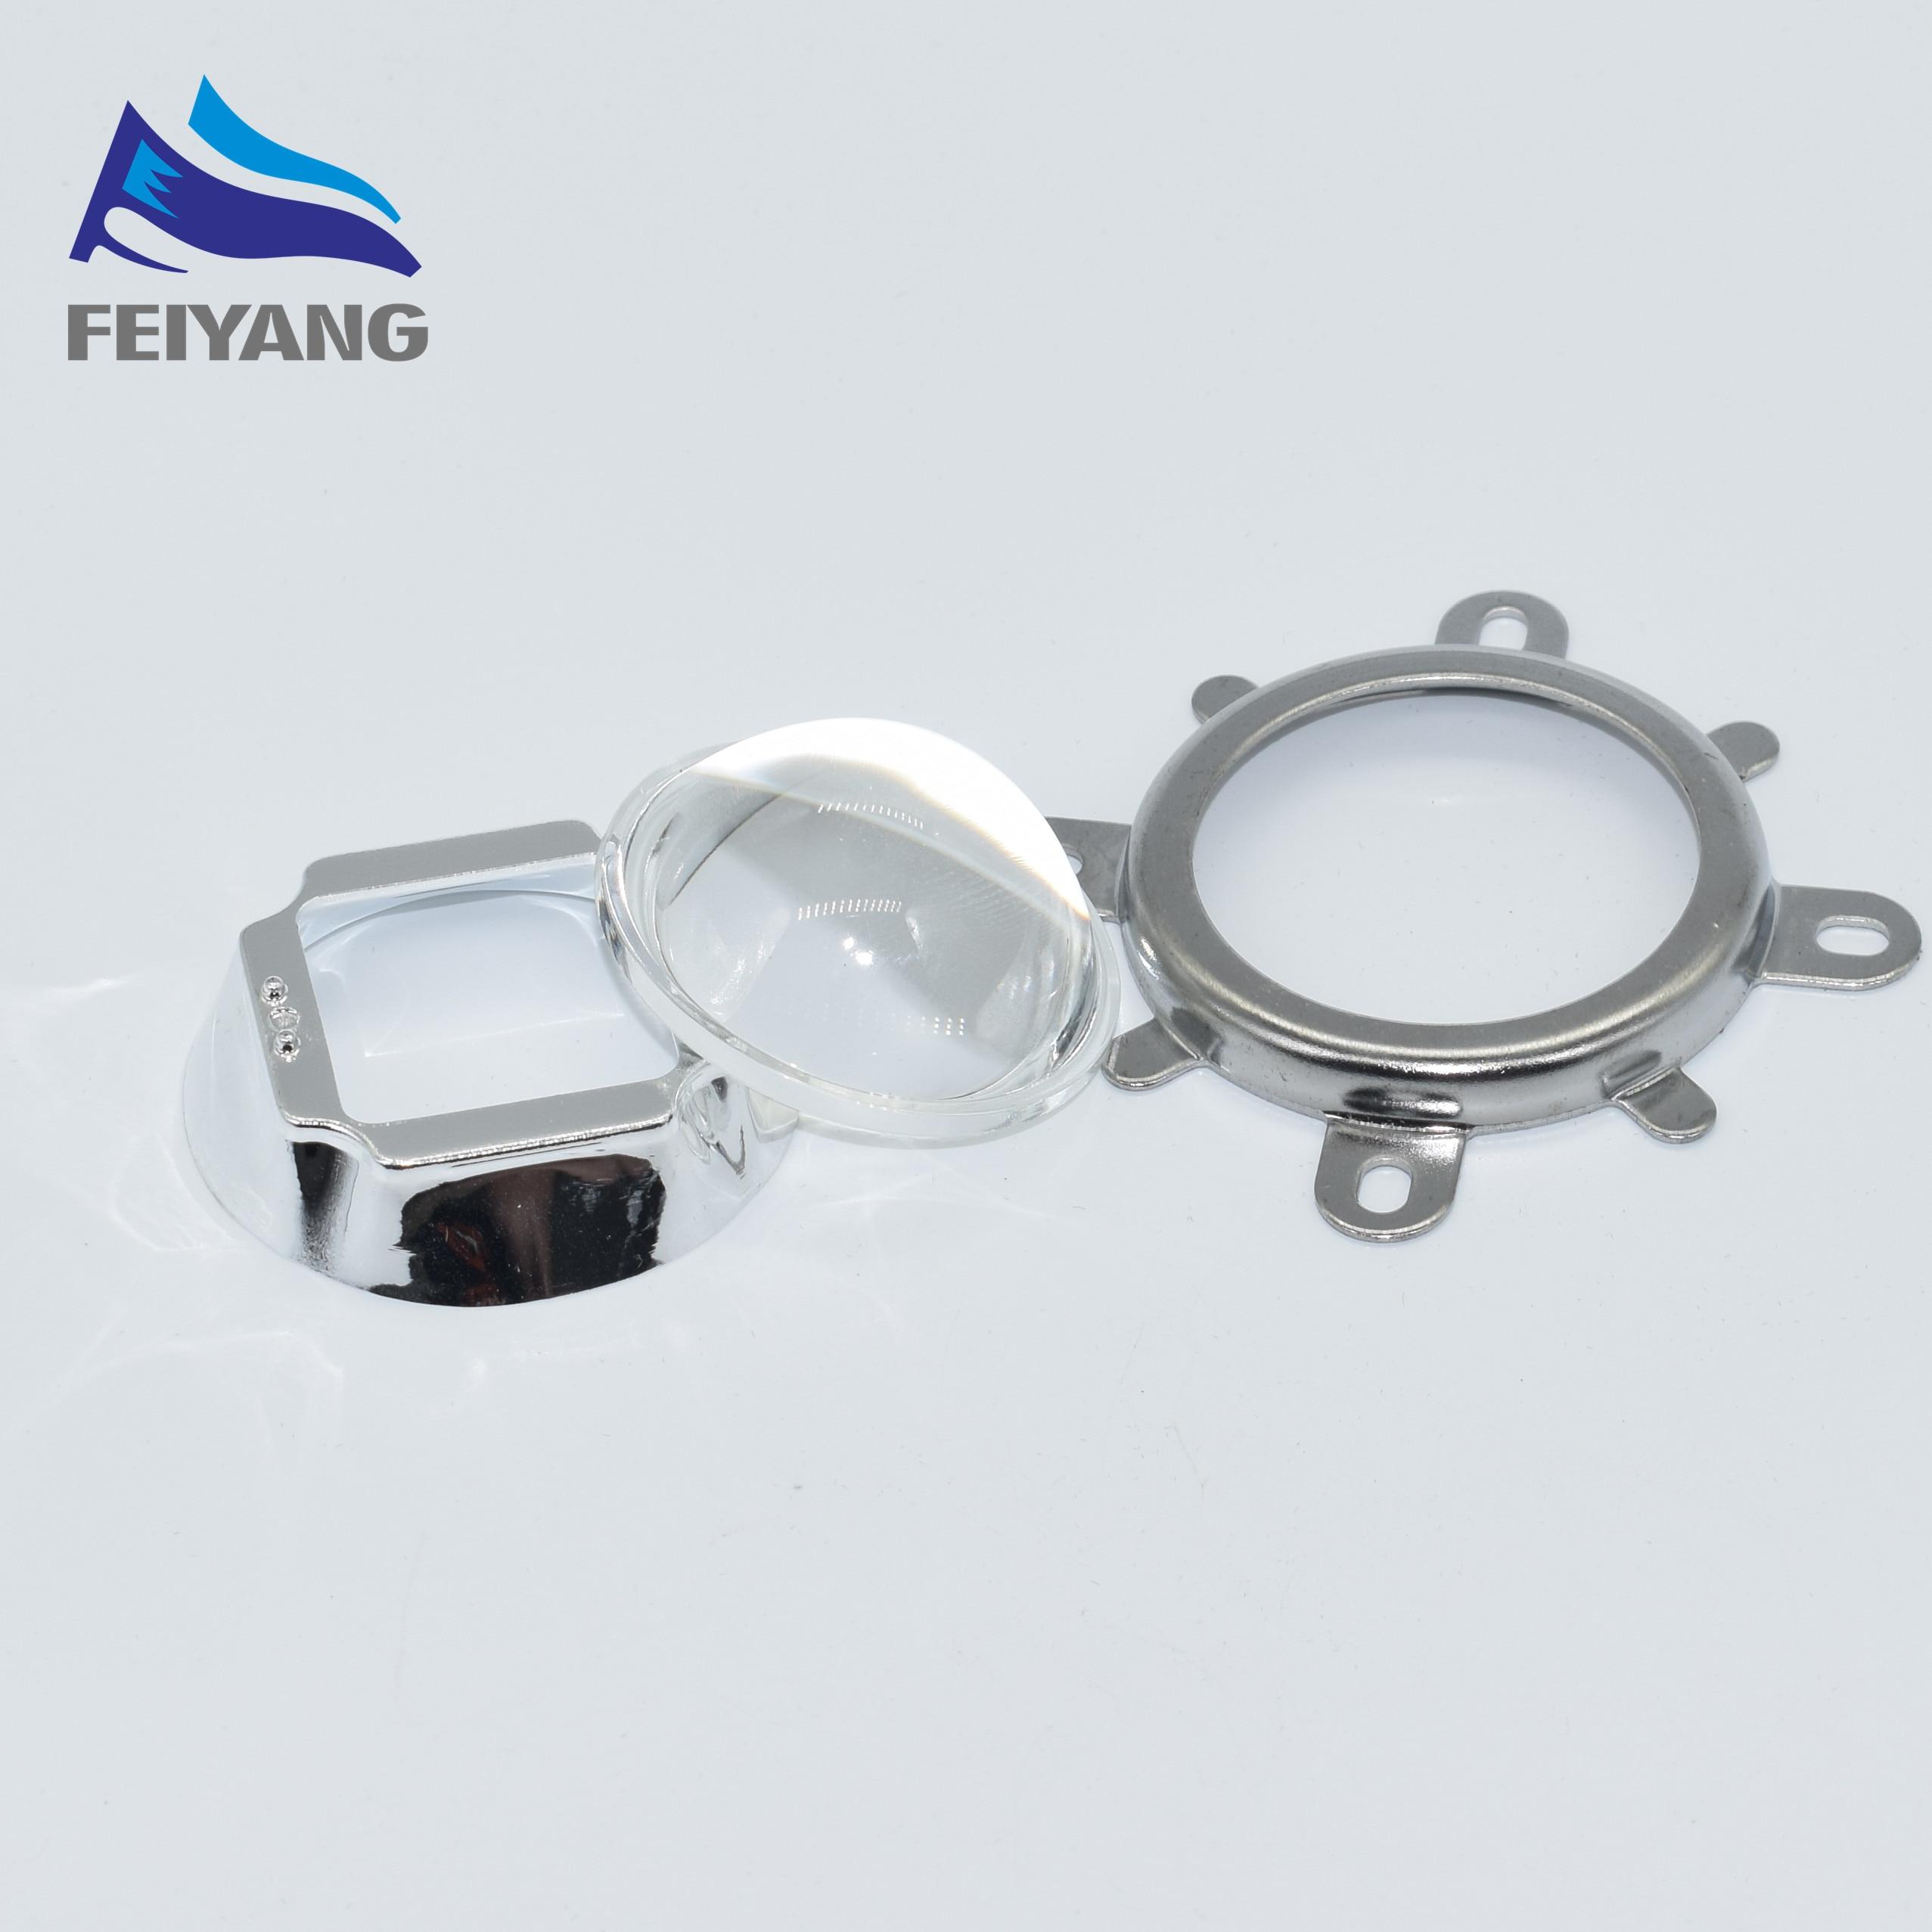 10Set/Lot High Quality 30W 50W 100W LED 44mm Lens + Reflector Collimator + Fixed Bracket Drop